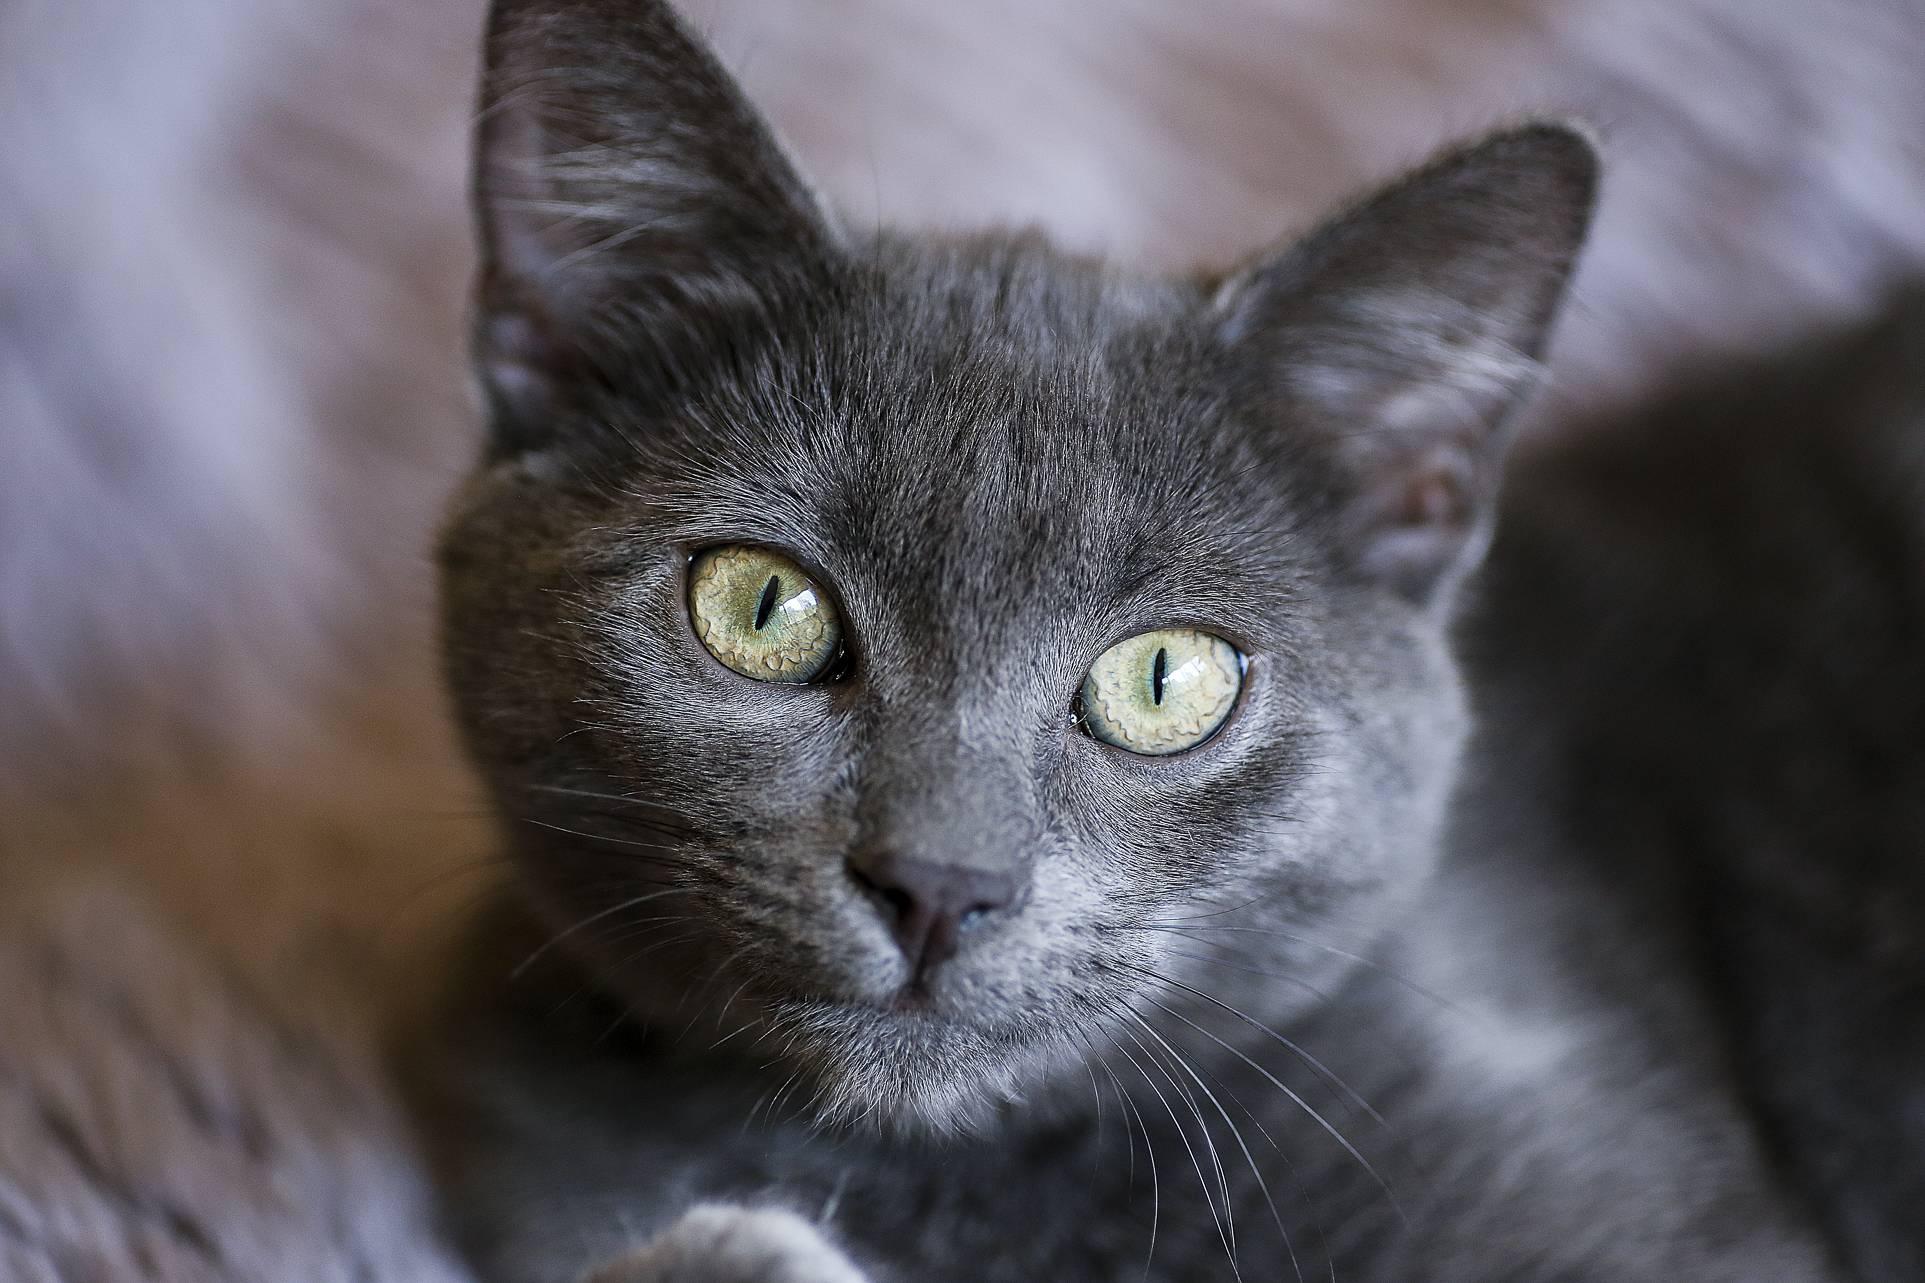 Neelix the kitten looking at you